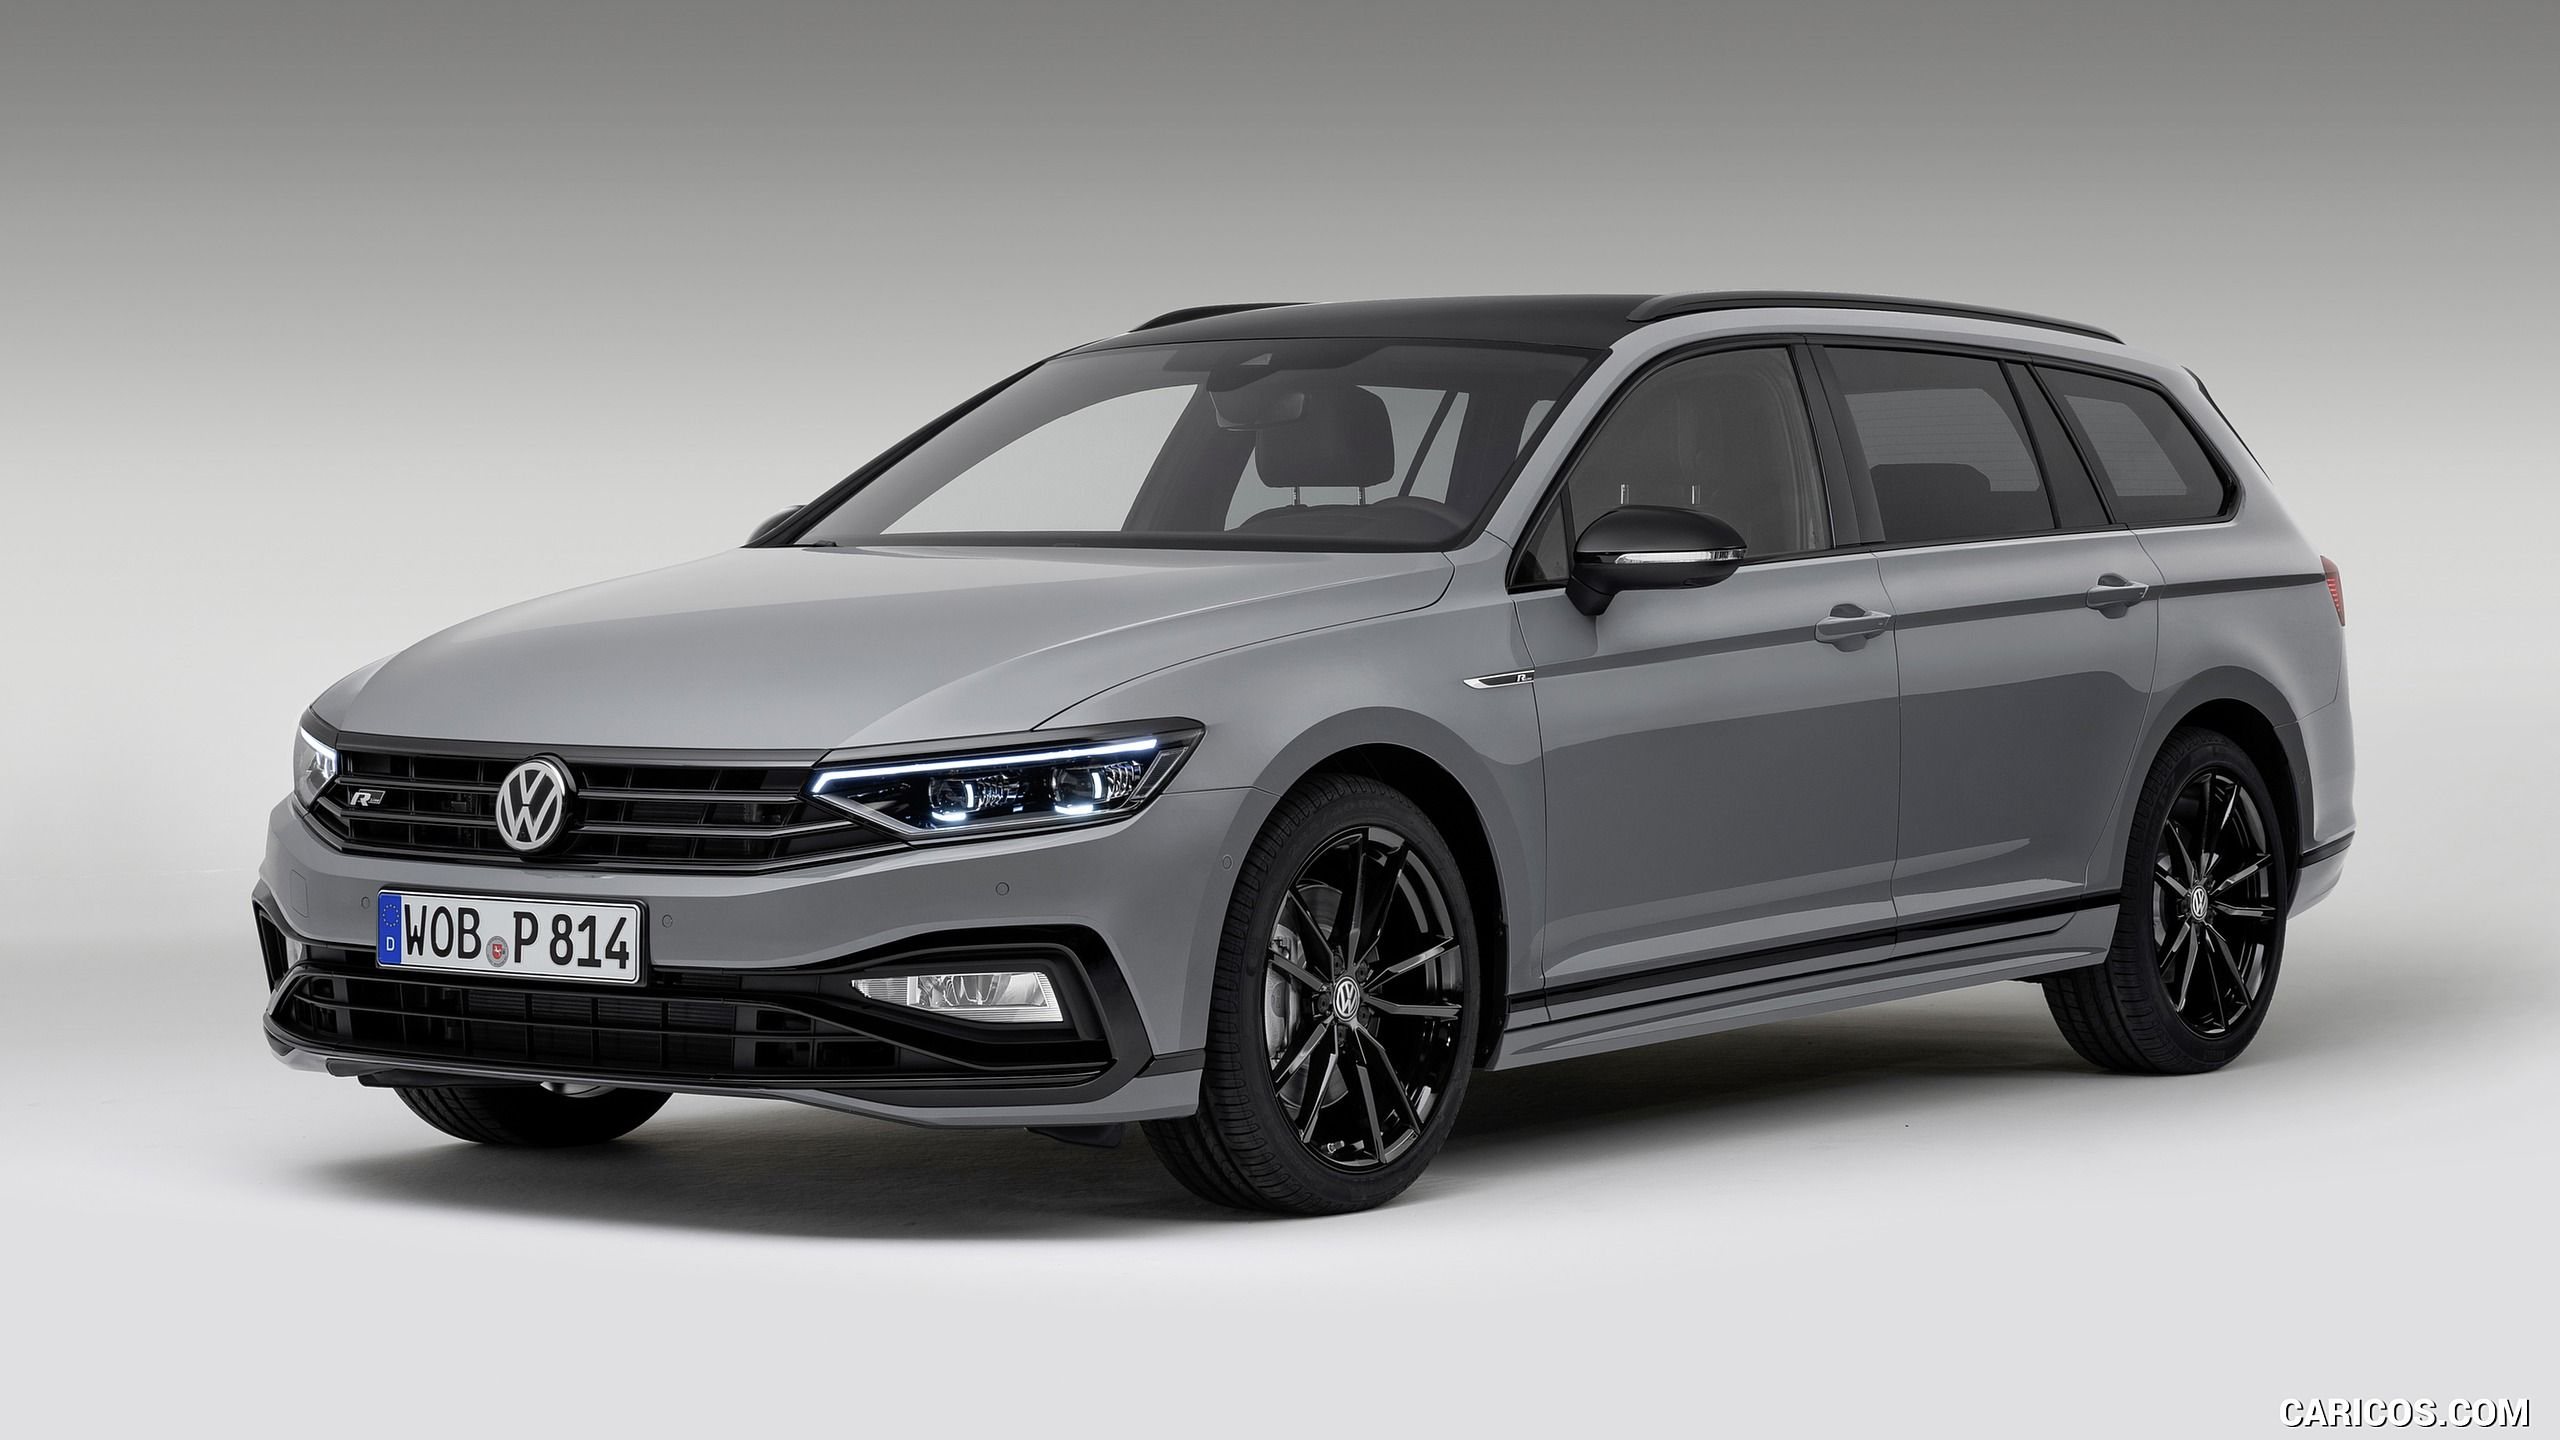 2019 Volkswagen Passat Variant R Line Edition Eu Spec Front Three Quarter Hd Jetta Wagon Vw Passat Volkswagen Passat